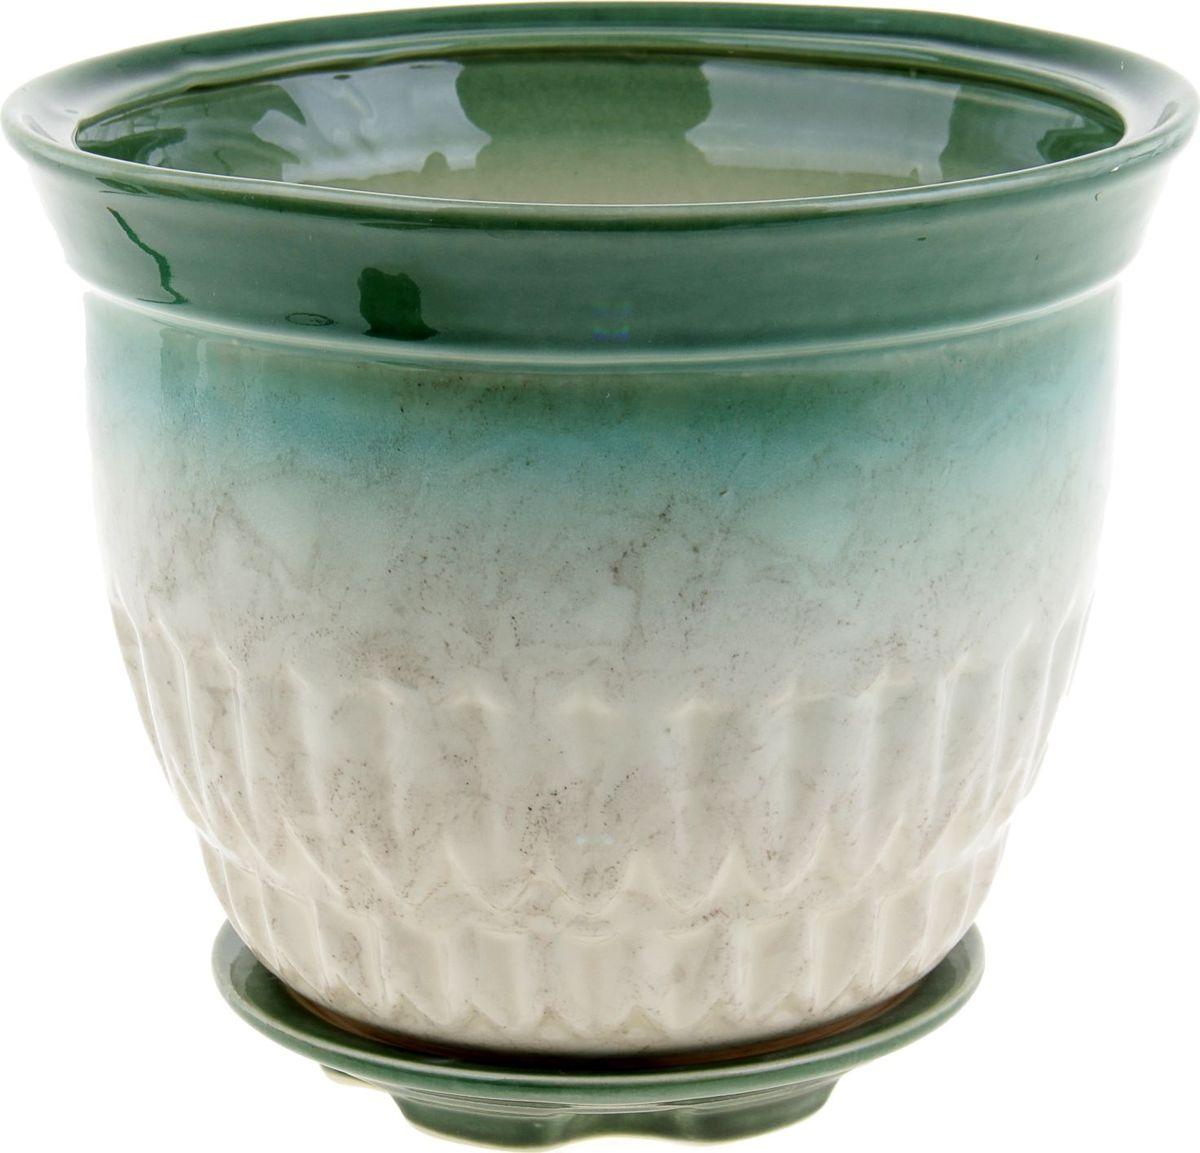 Кашпо Балеро, цвет: белый, зеленый, 4,3 л838531